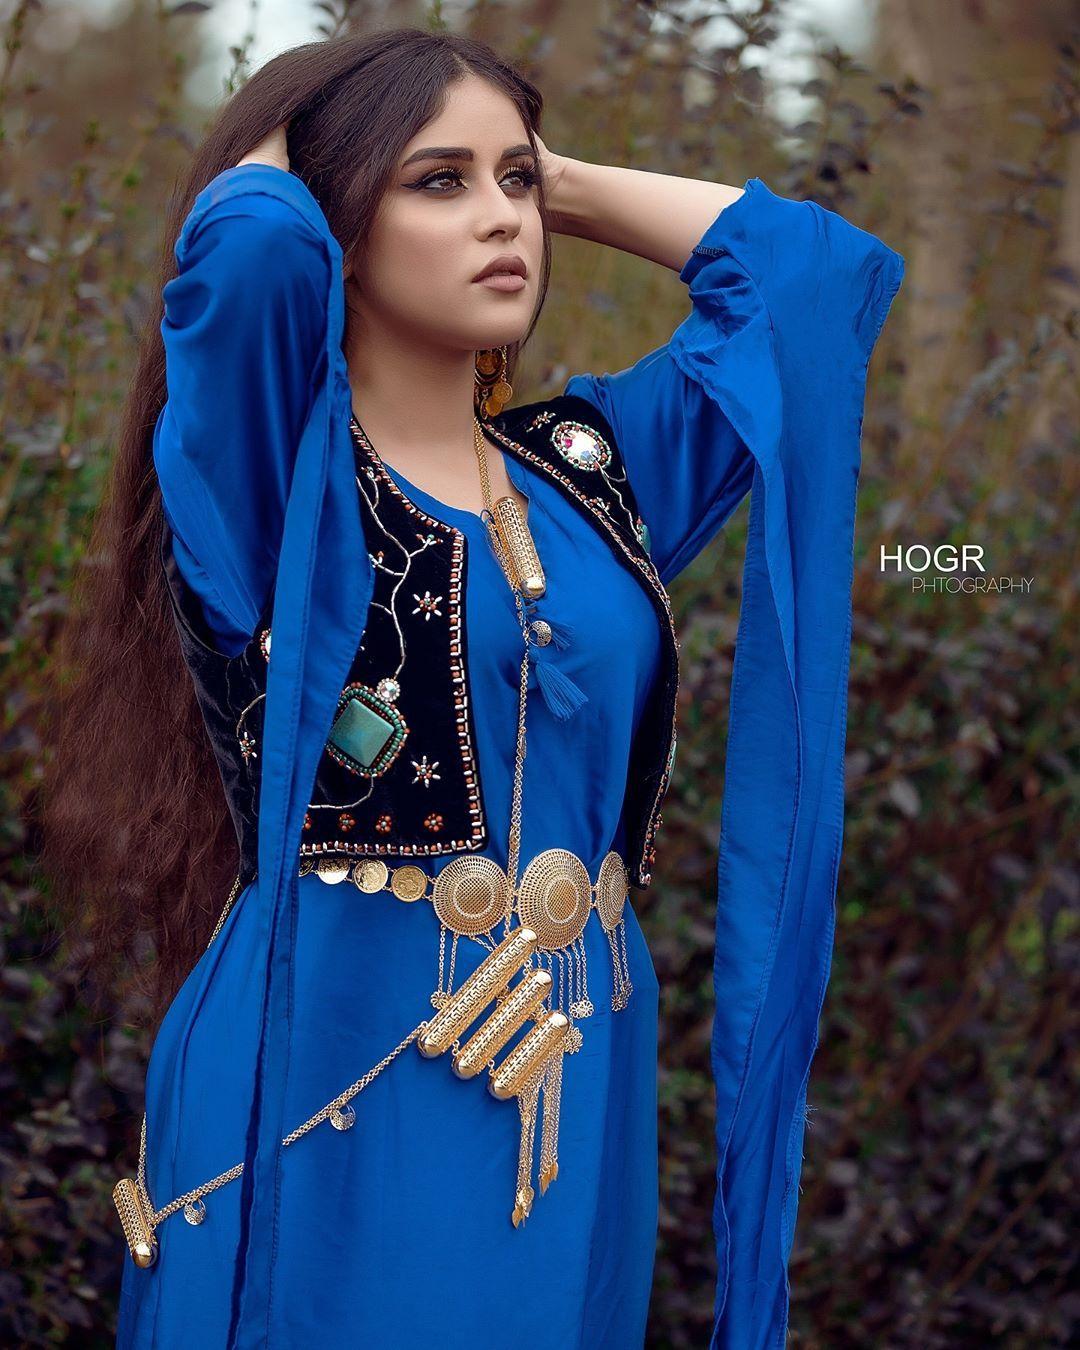 Korek 07501213858 Asia 07730213858 Snapchat Hogr Photo Design B Fashion Clothes Traditional Outfits